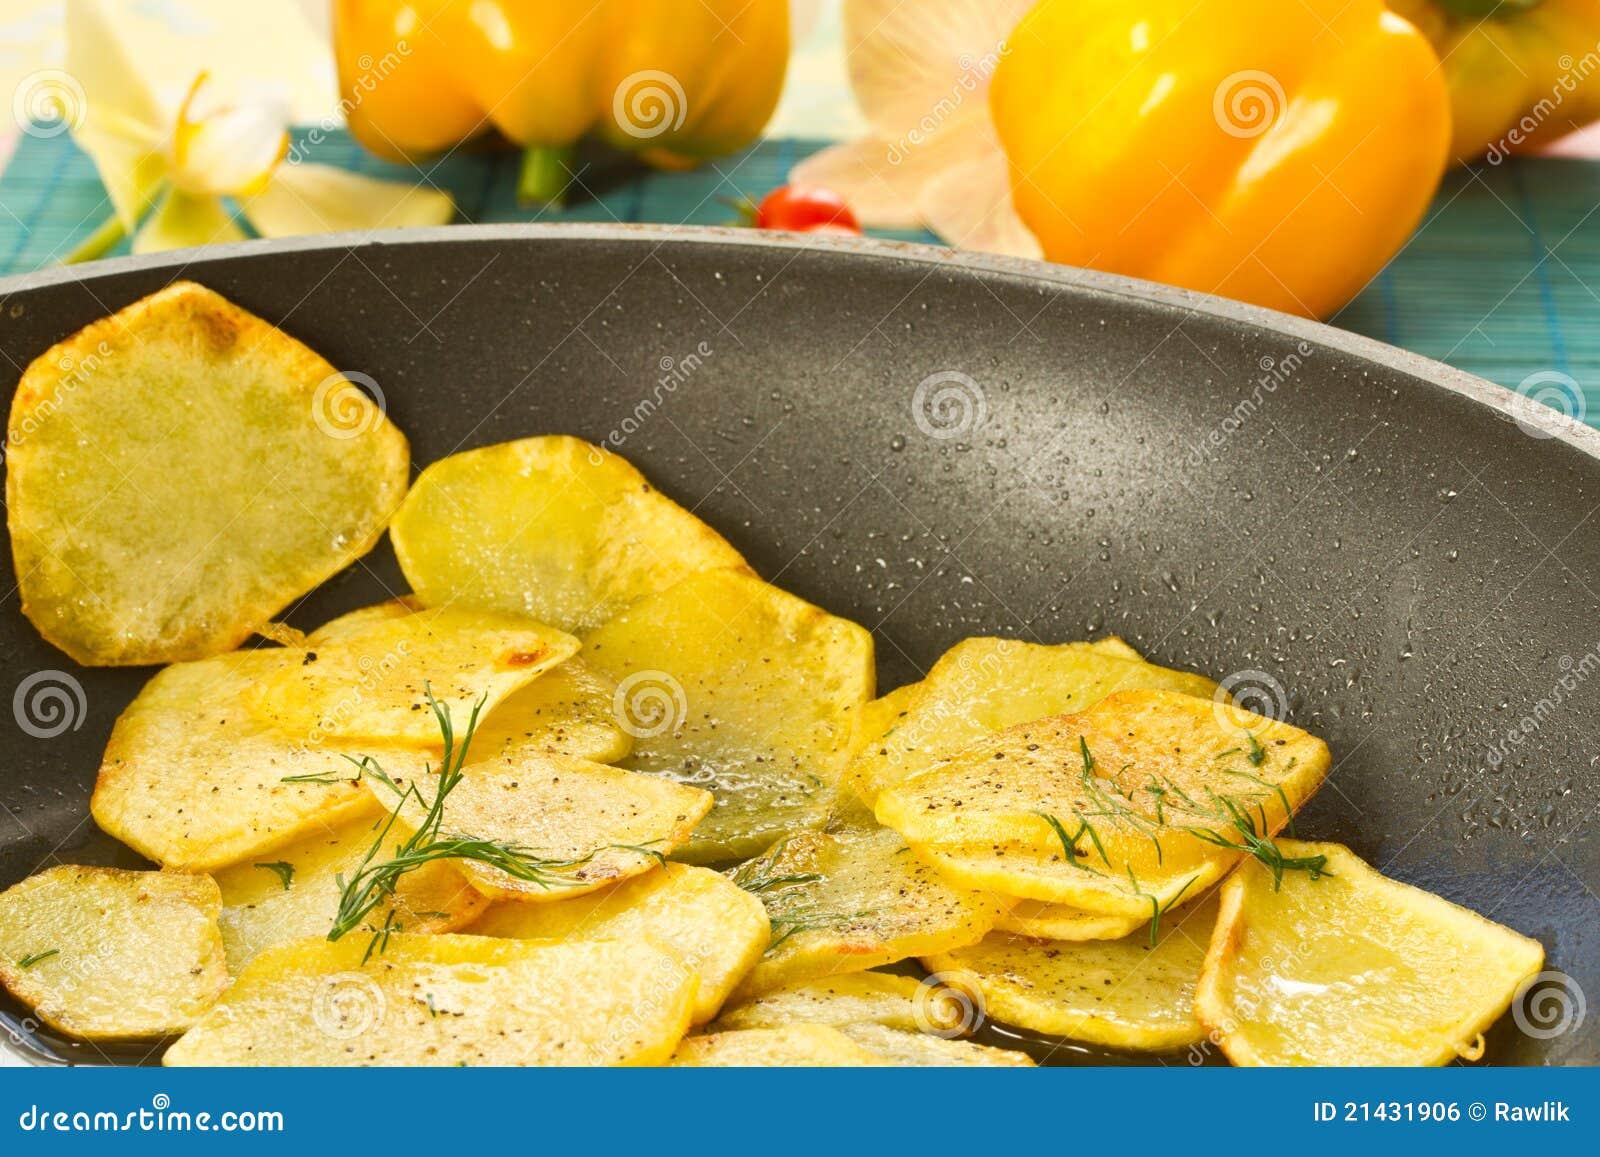 Fried Potatoes Royalty Free Stock Image - Image: 21431906